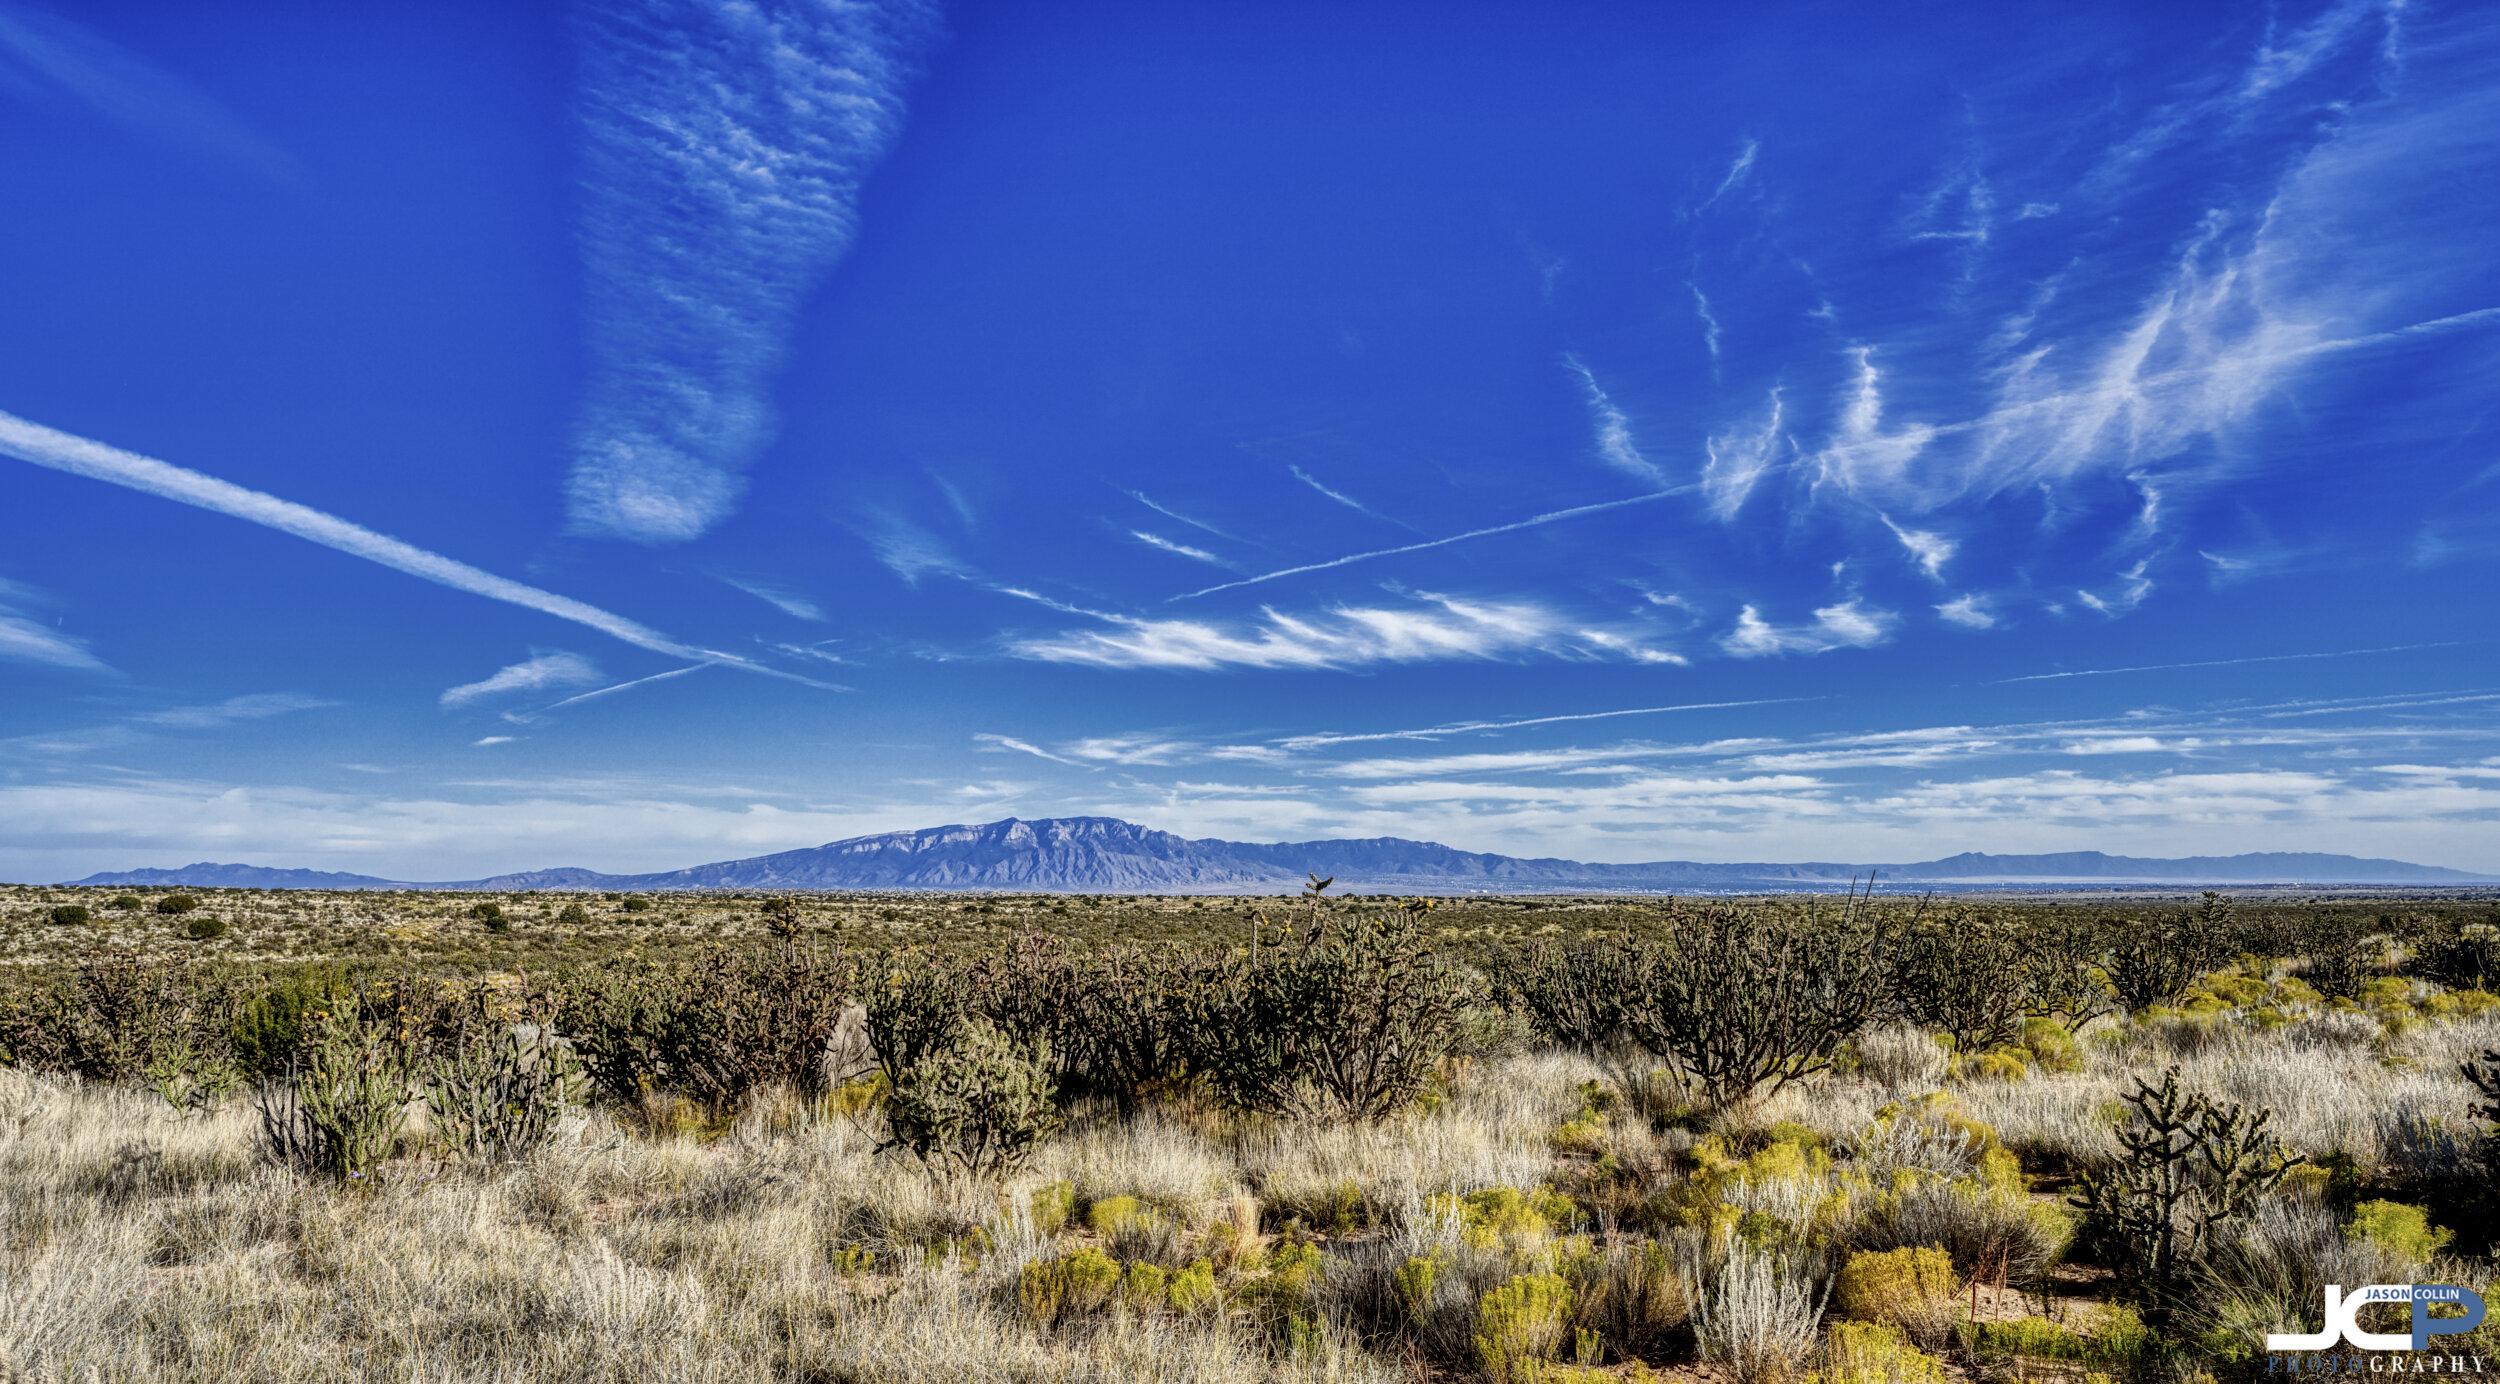 Early autumn blue skies over the Sandia Mountain